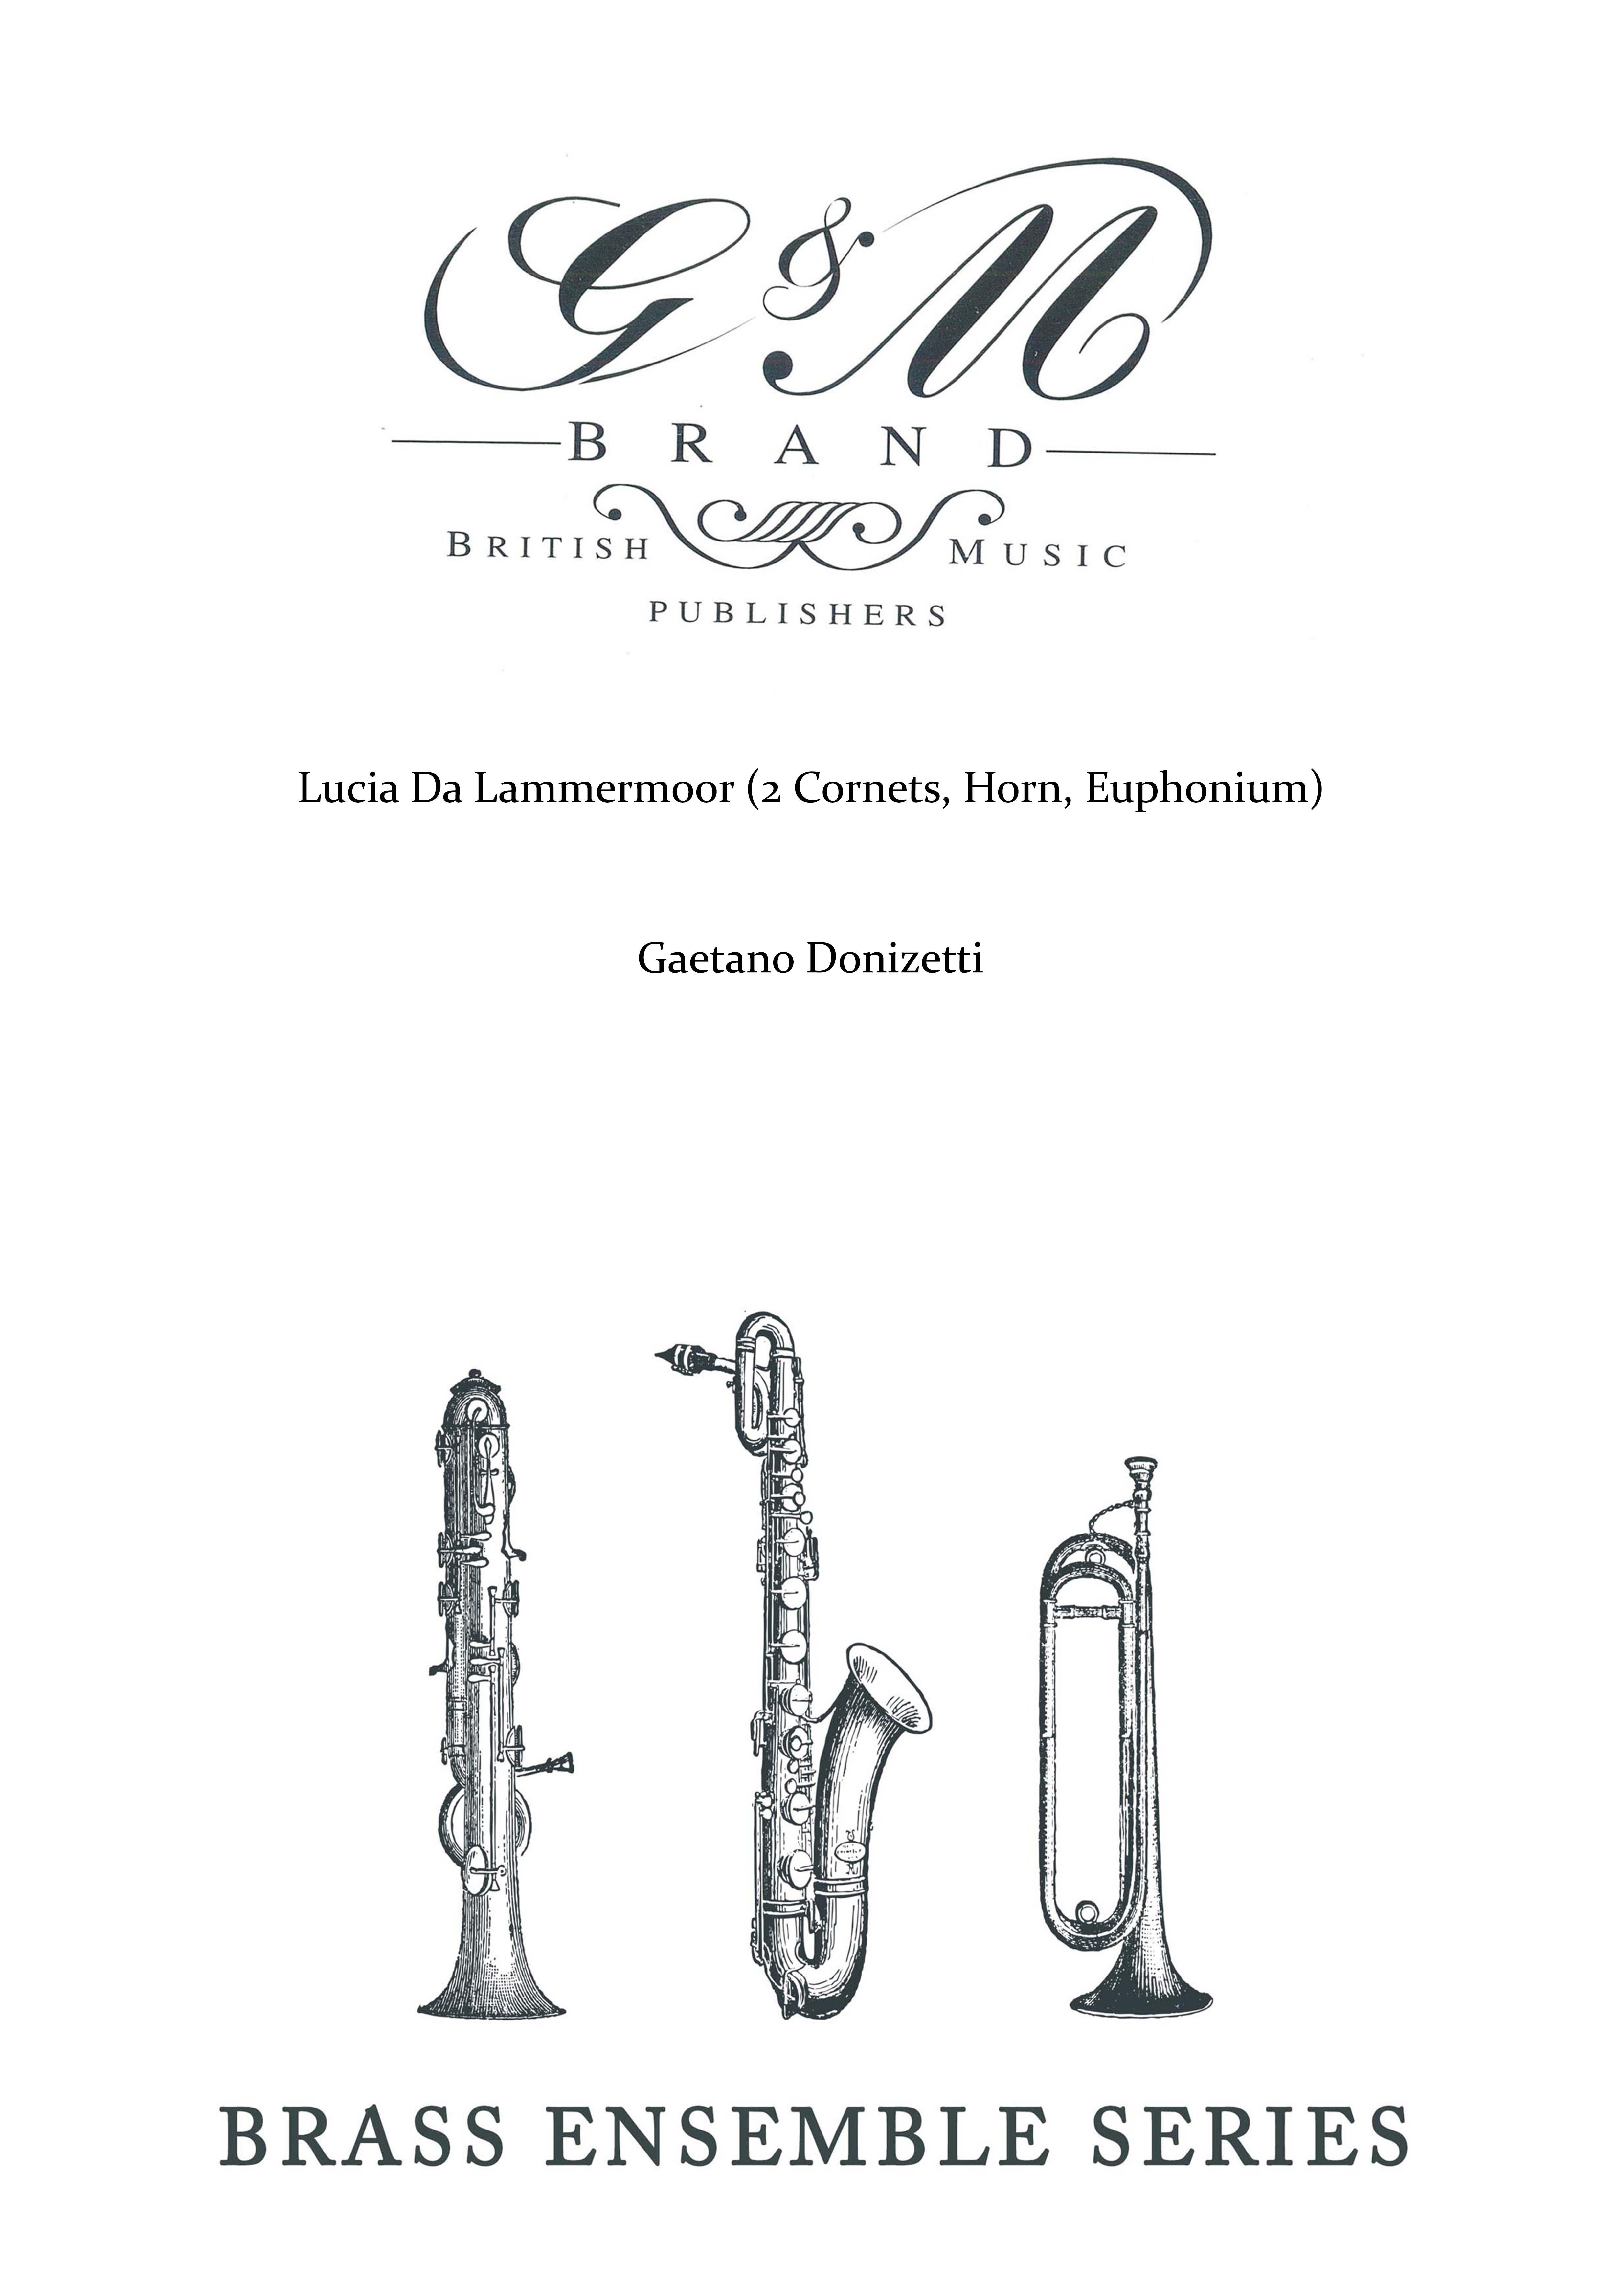 Lucia Da Lammermoor (2 Cornets, Horn, Euphonium)